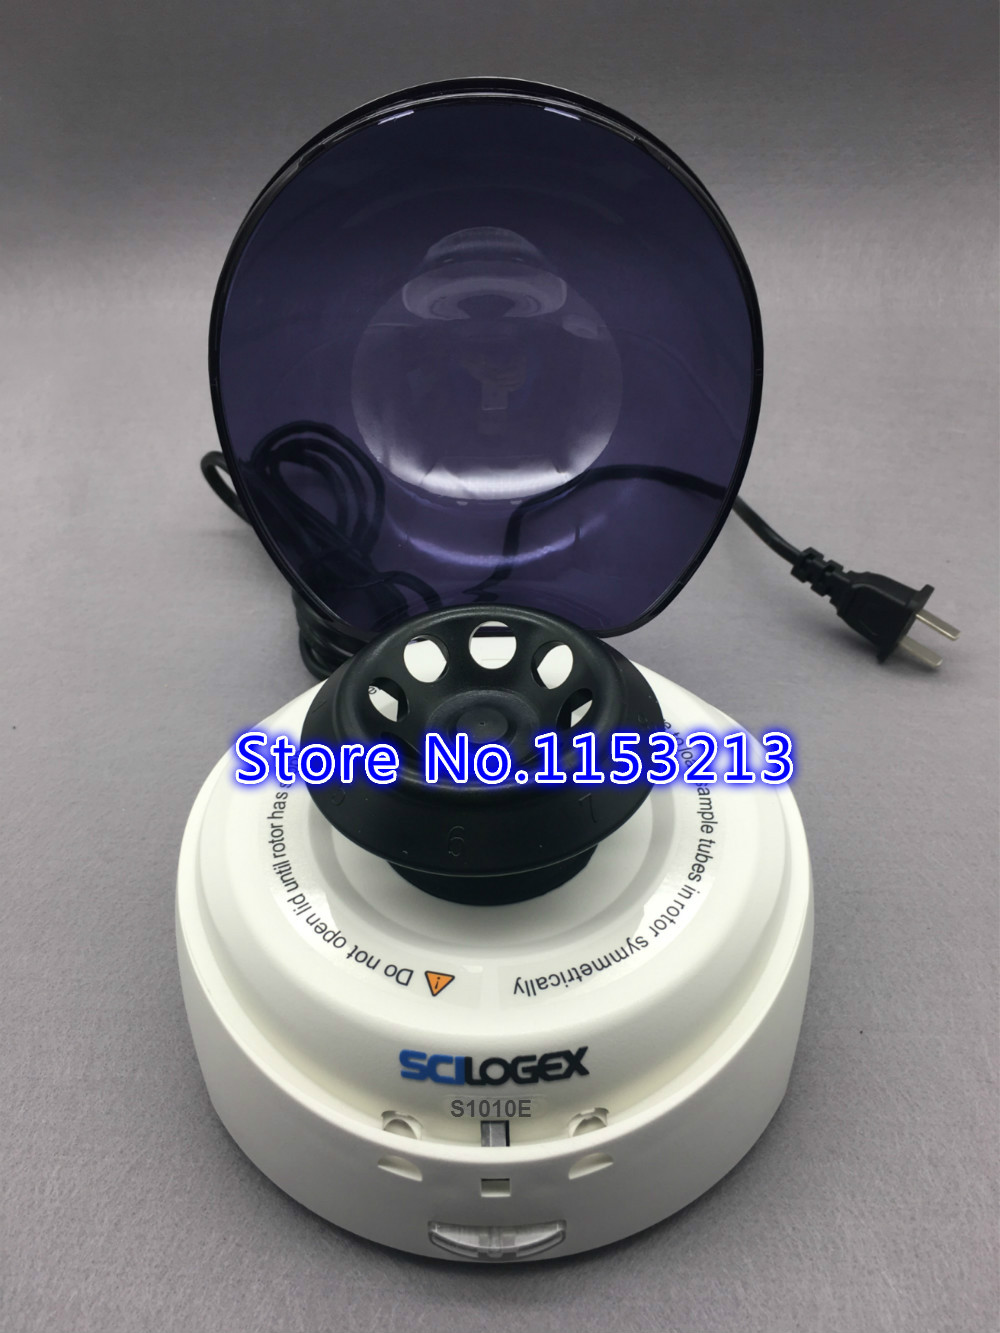 SCILOGEX S1010E Mini-Centrifugeuses 5000 rpm Mini palme Centrifugeuse 0.5 ml, 1.5 ml, 2 ml Centrifugeuse De Laboratoire